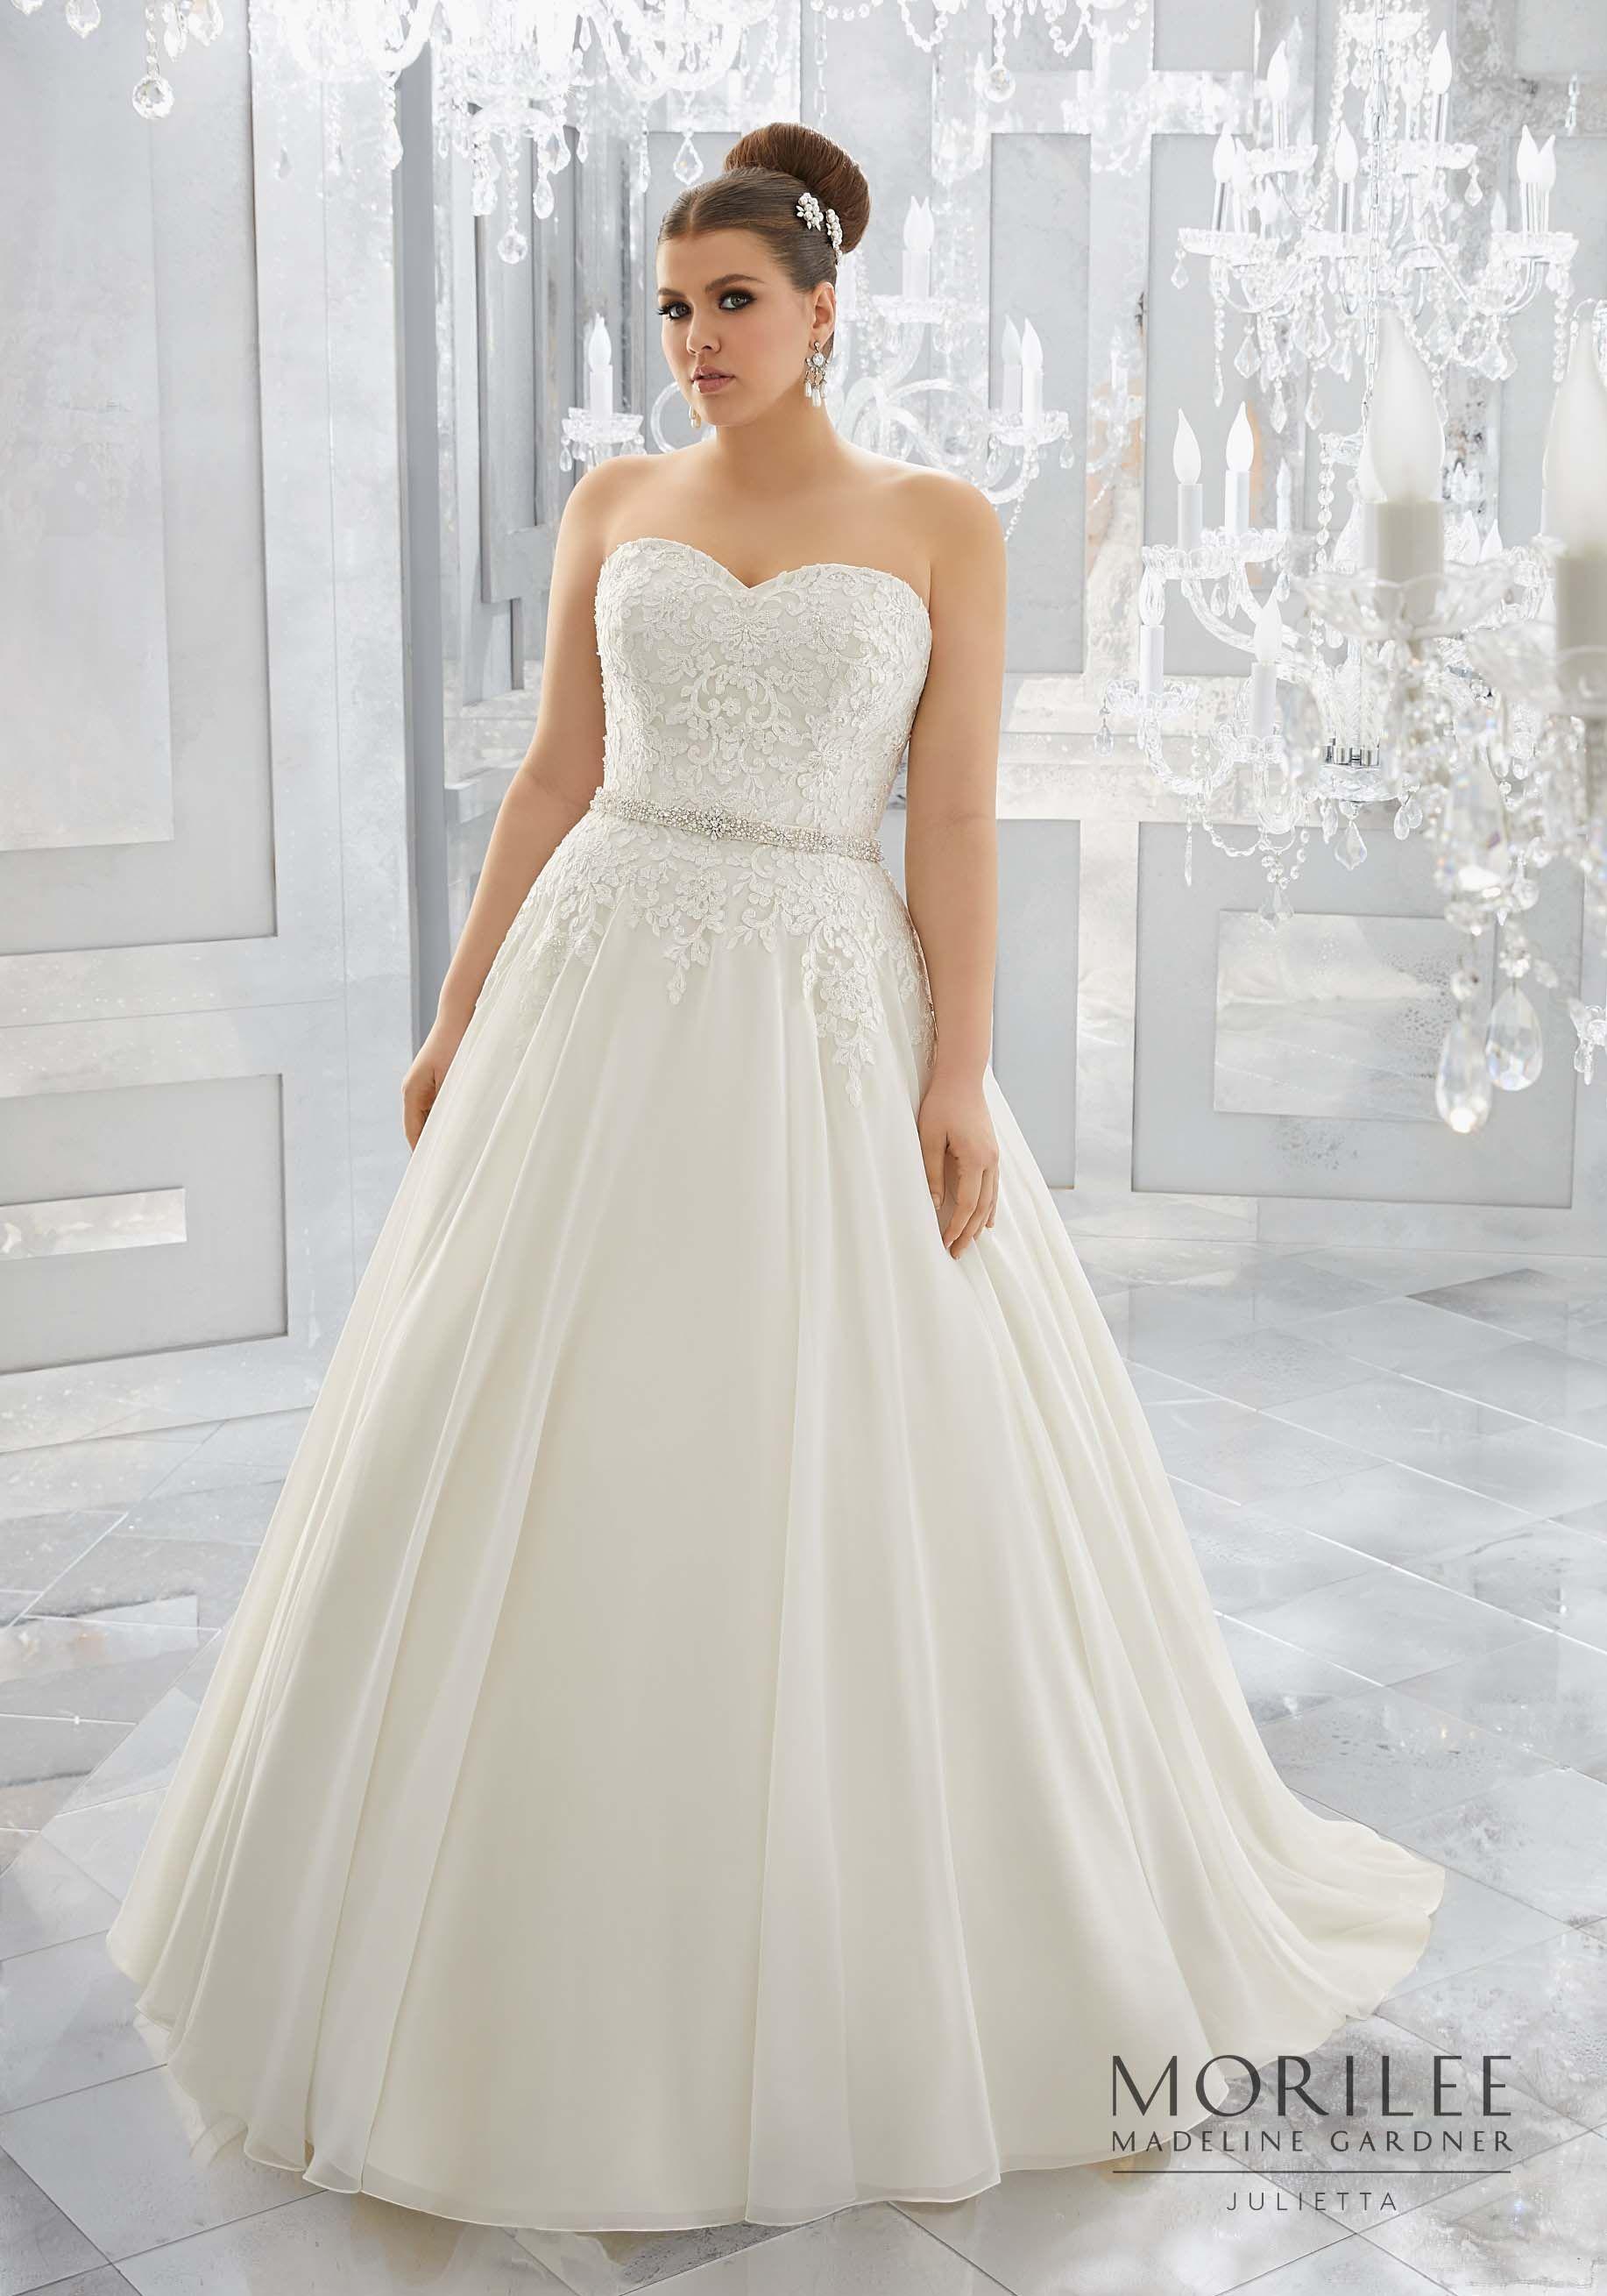 Mabel Plus Size Wedding Dress Morilee Wedding Dresses Bridal Ball Gown Beautiful Wedding Dresses